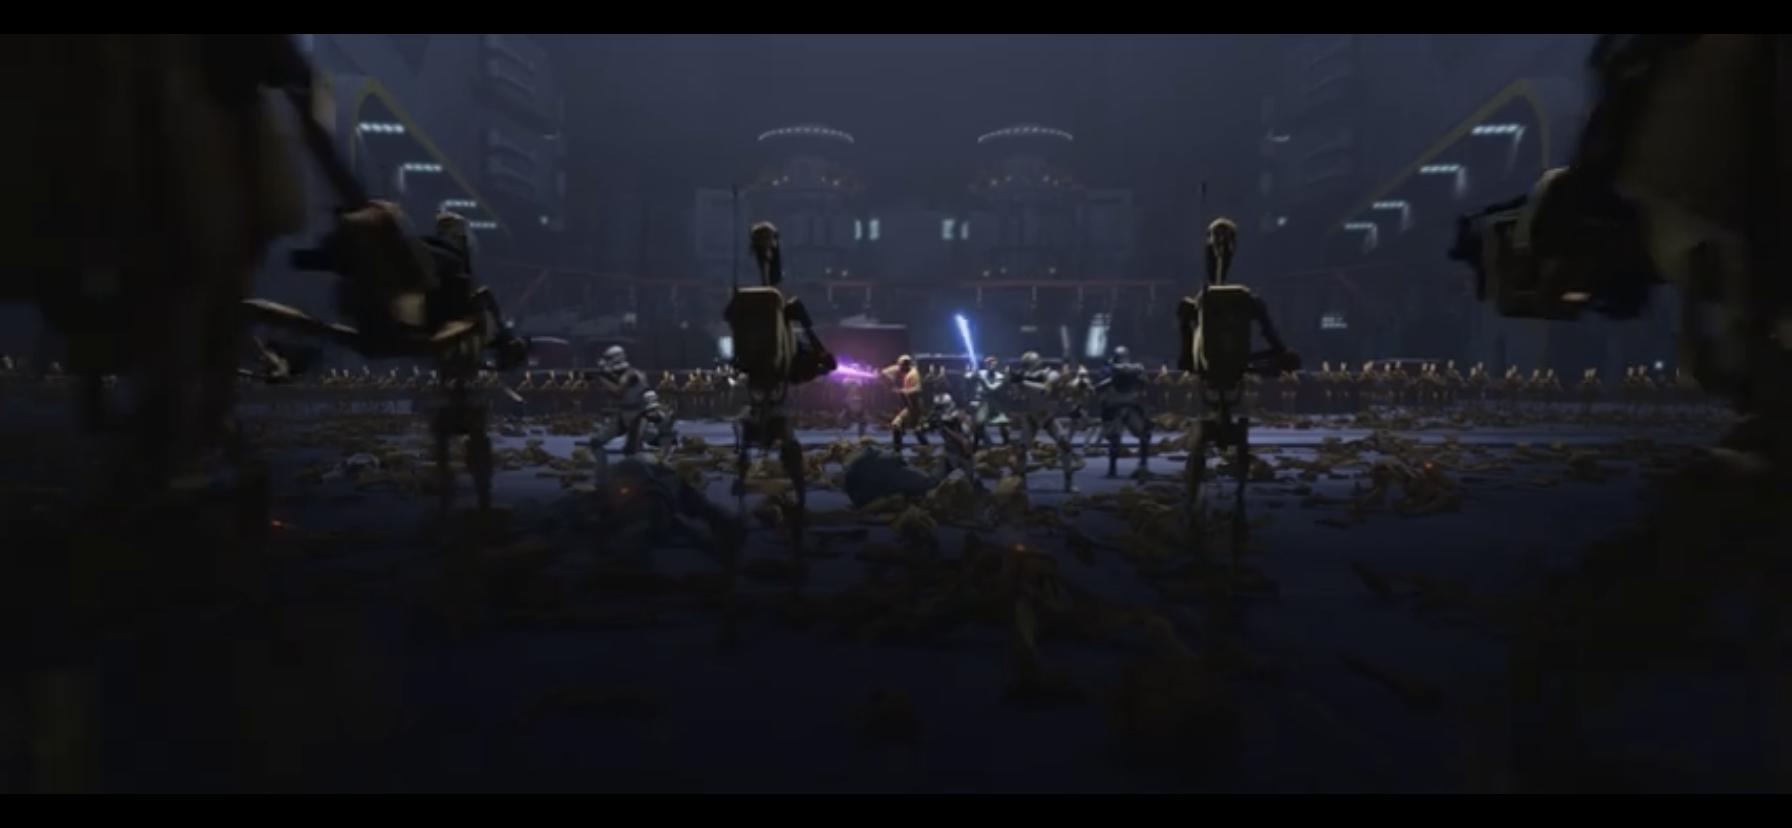 Obi-Wan & Mace Windu taking on an army of battle droids